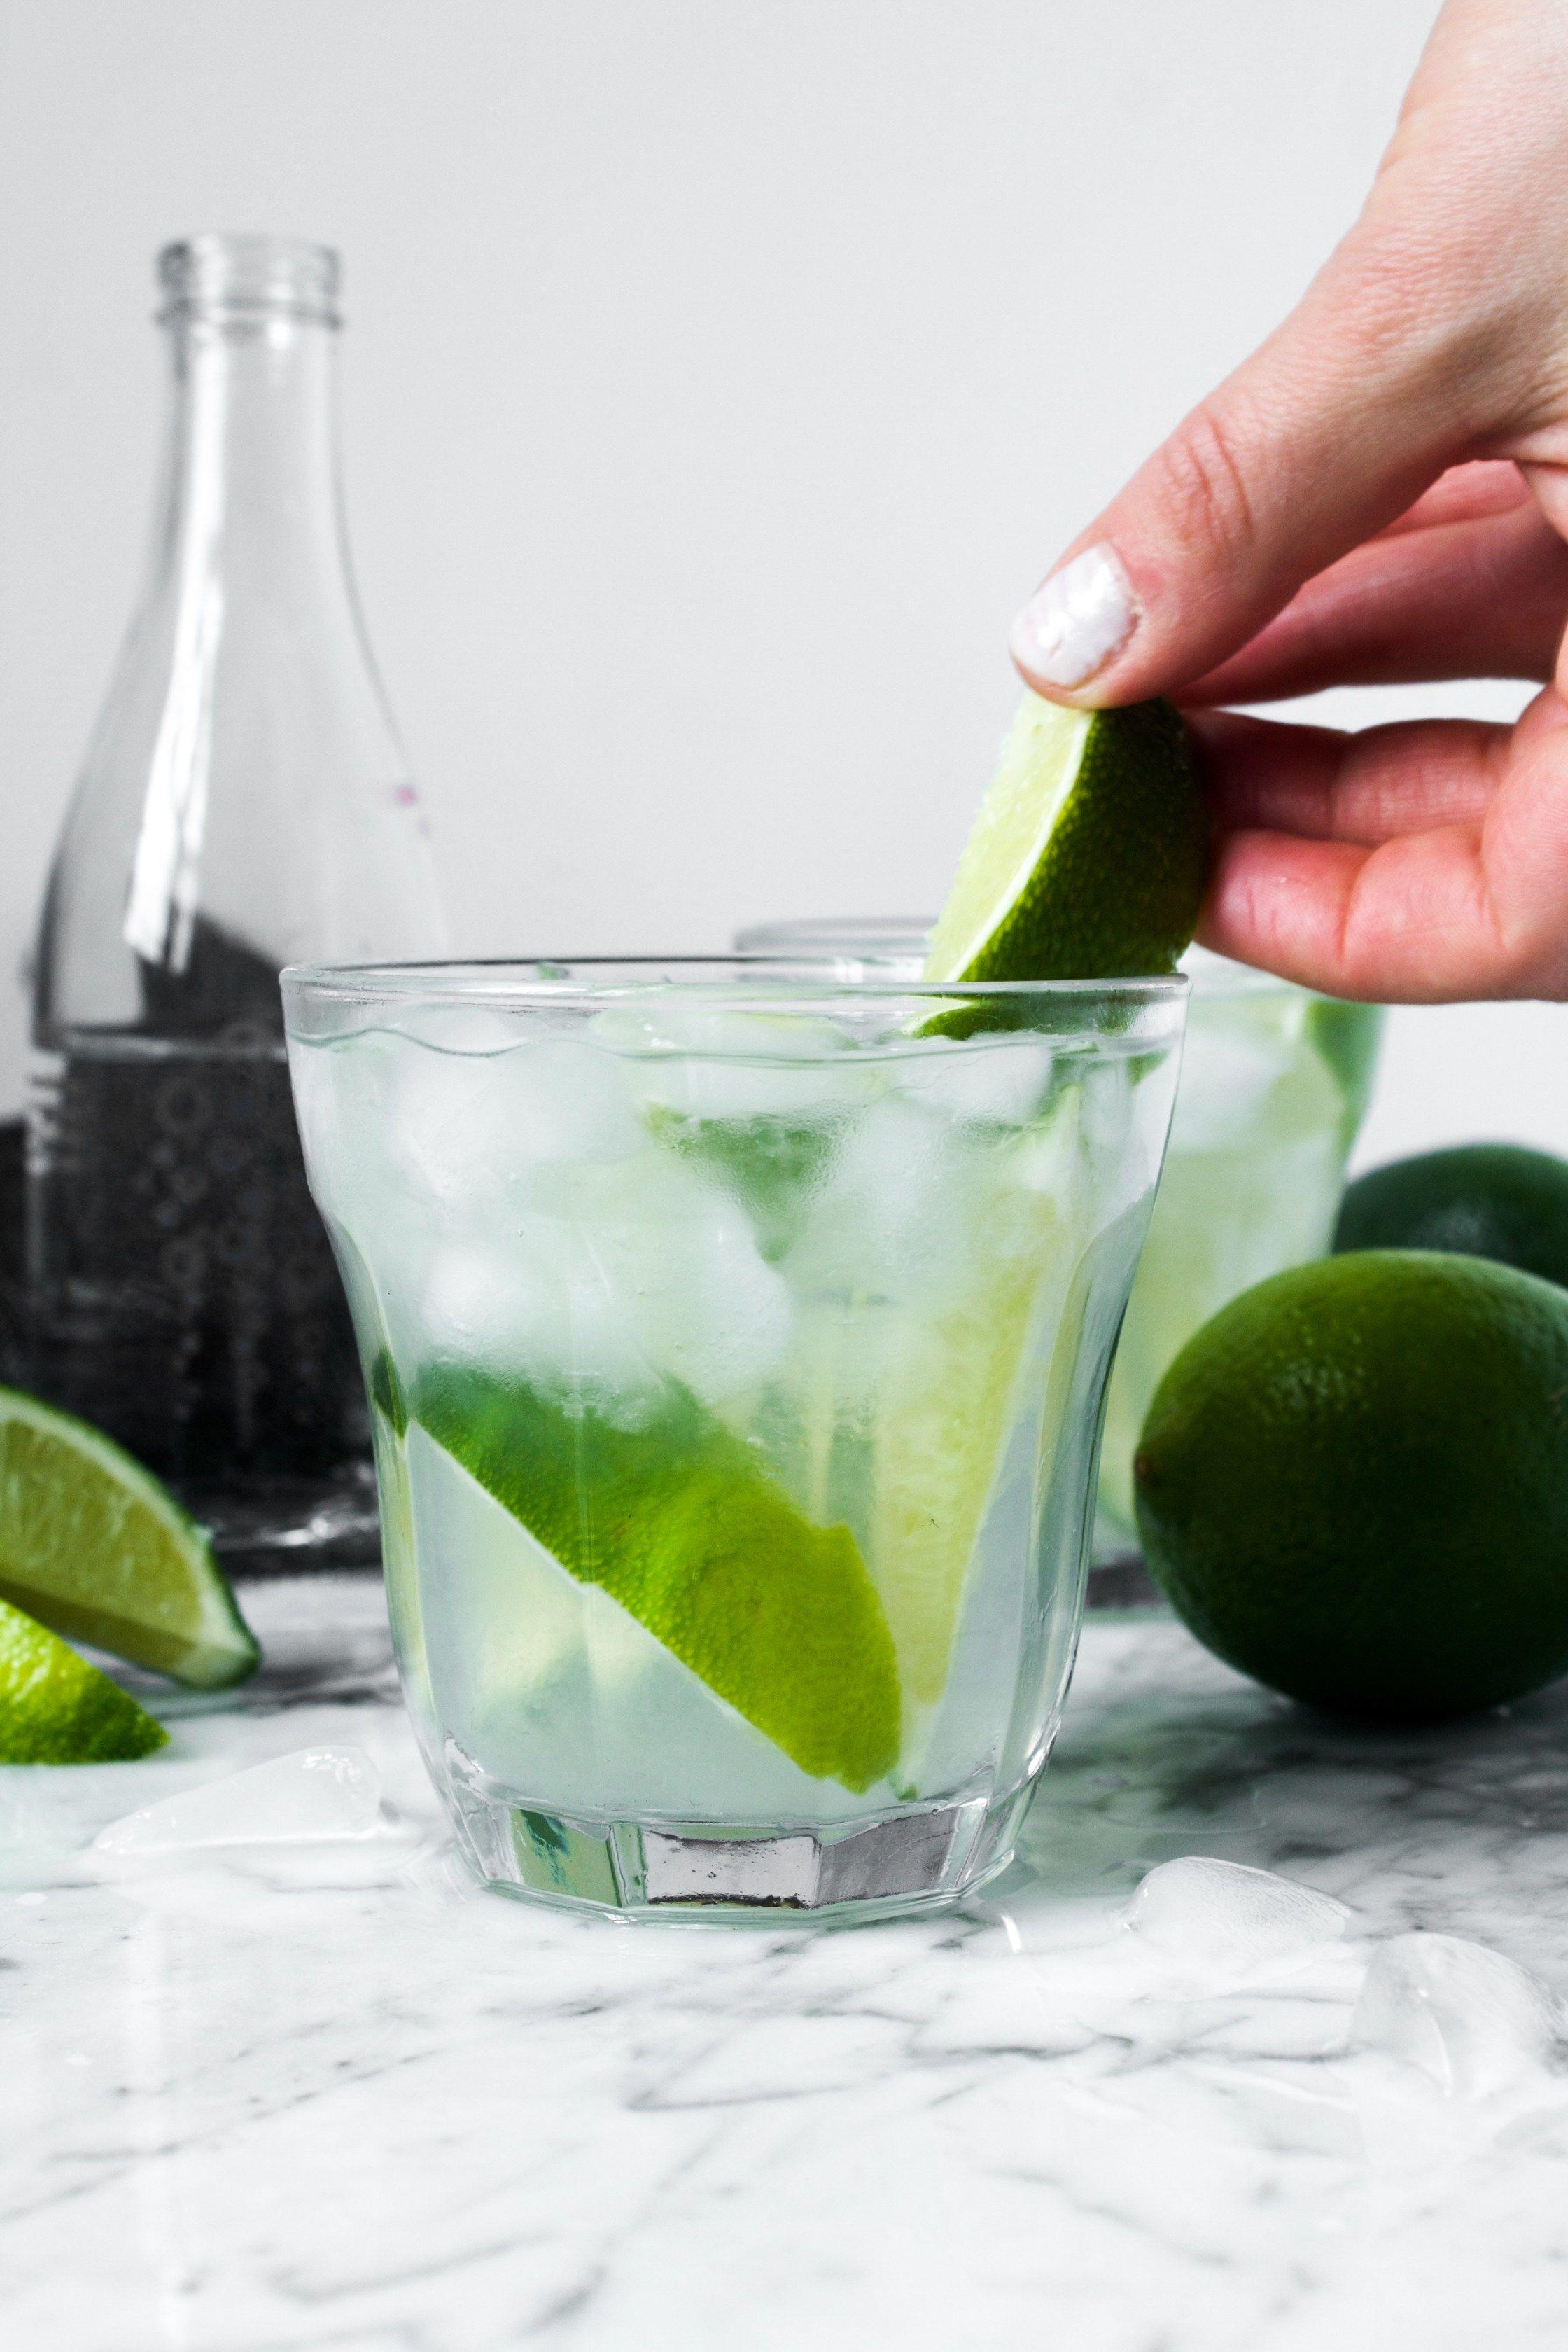 Caipirinha Cocktail From Zestful Kitchen Recipe Caipirinha Recipe Caipirinha Cocktail Drinks Recipes